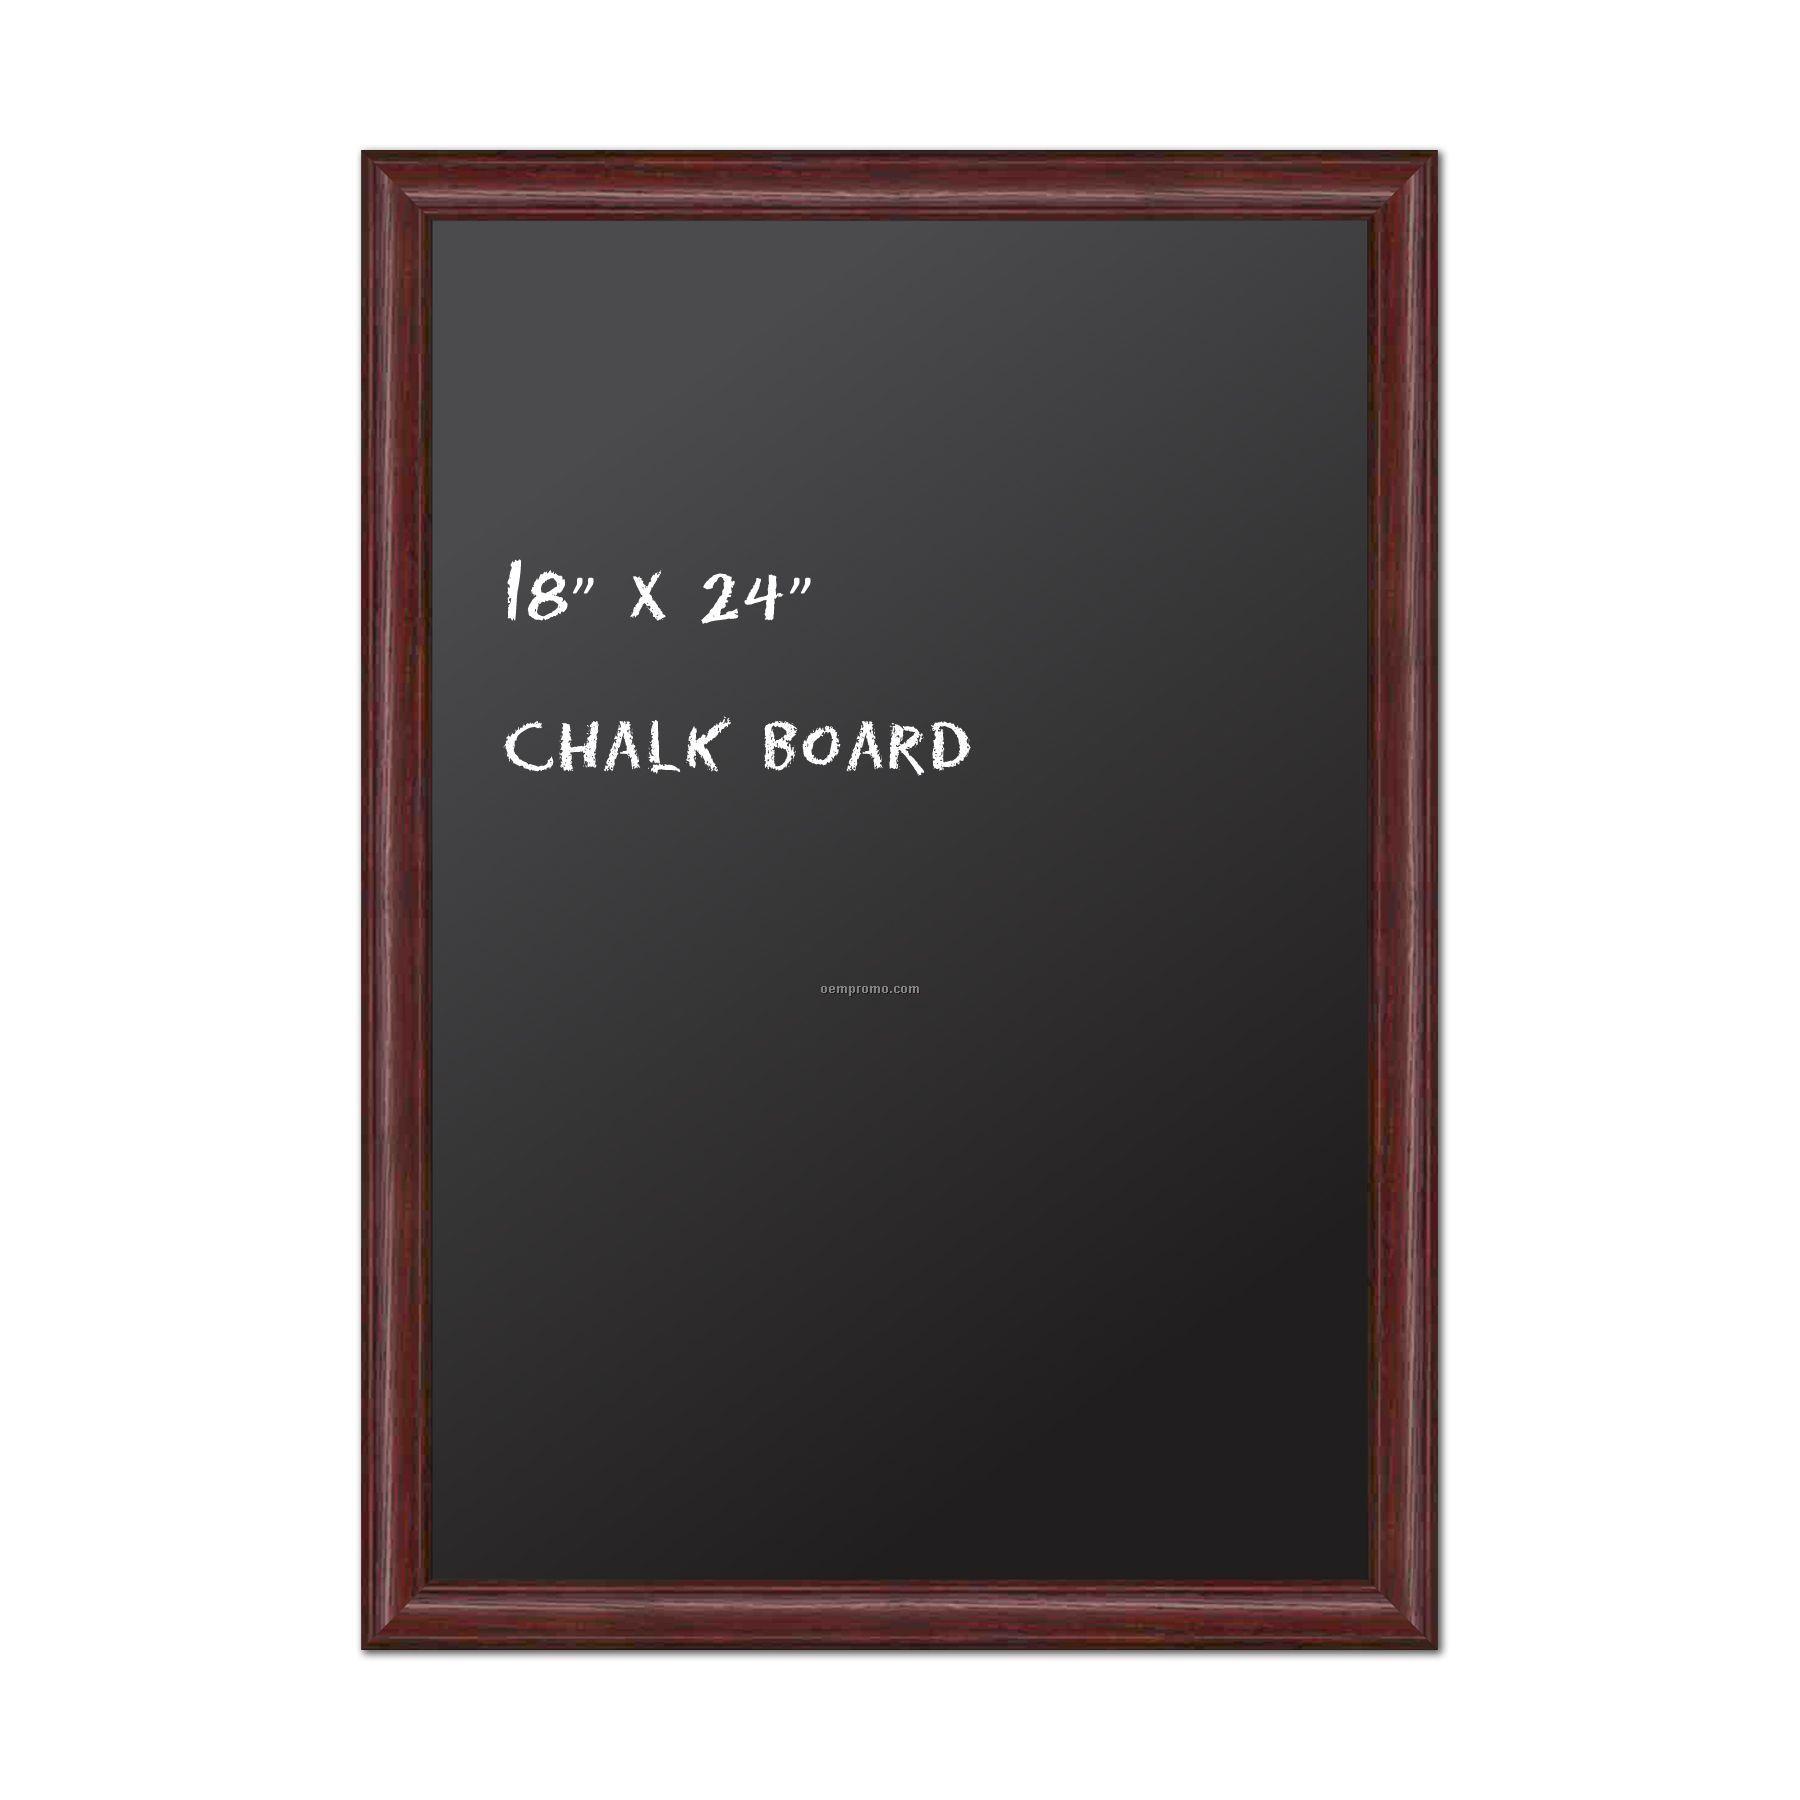 "Chalk Board 18"" X 24"". Real Wood Frame - Cherry Finish."